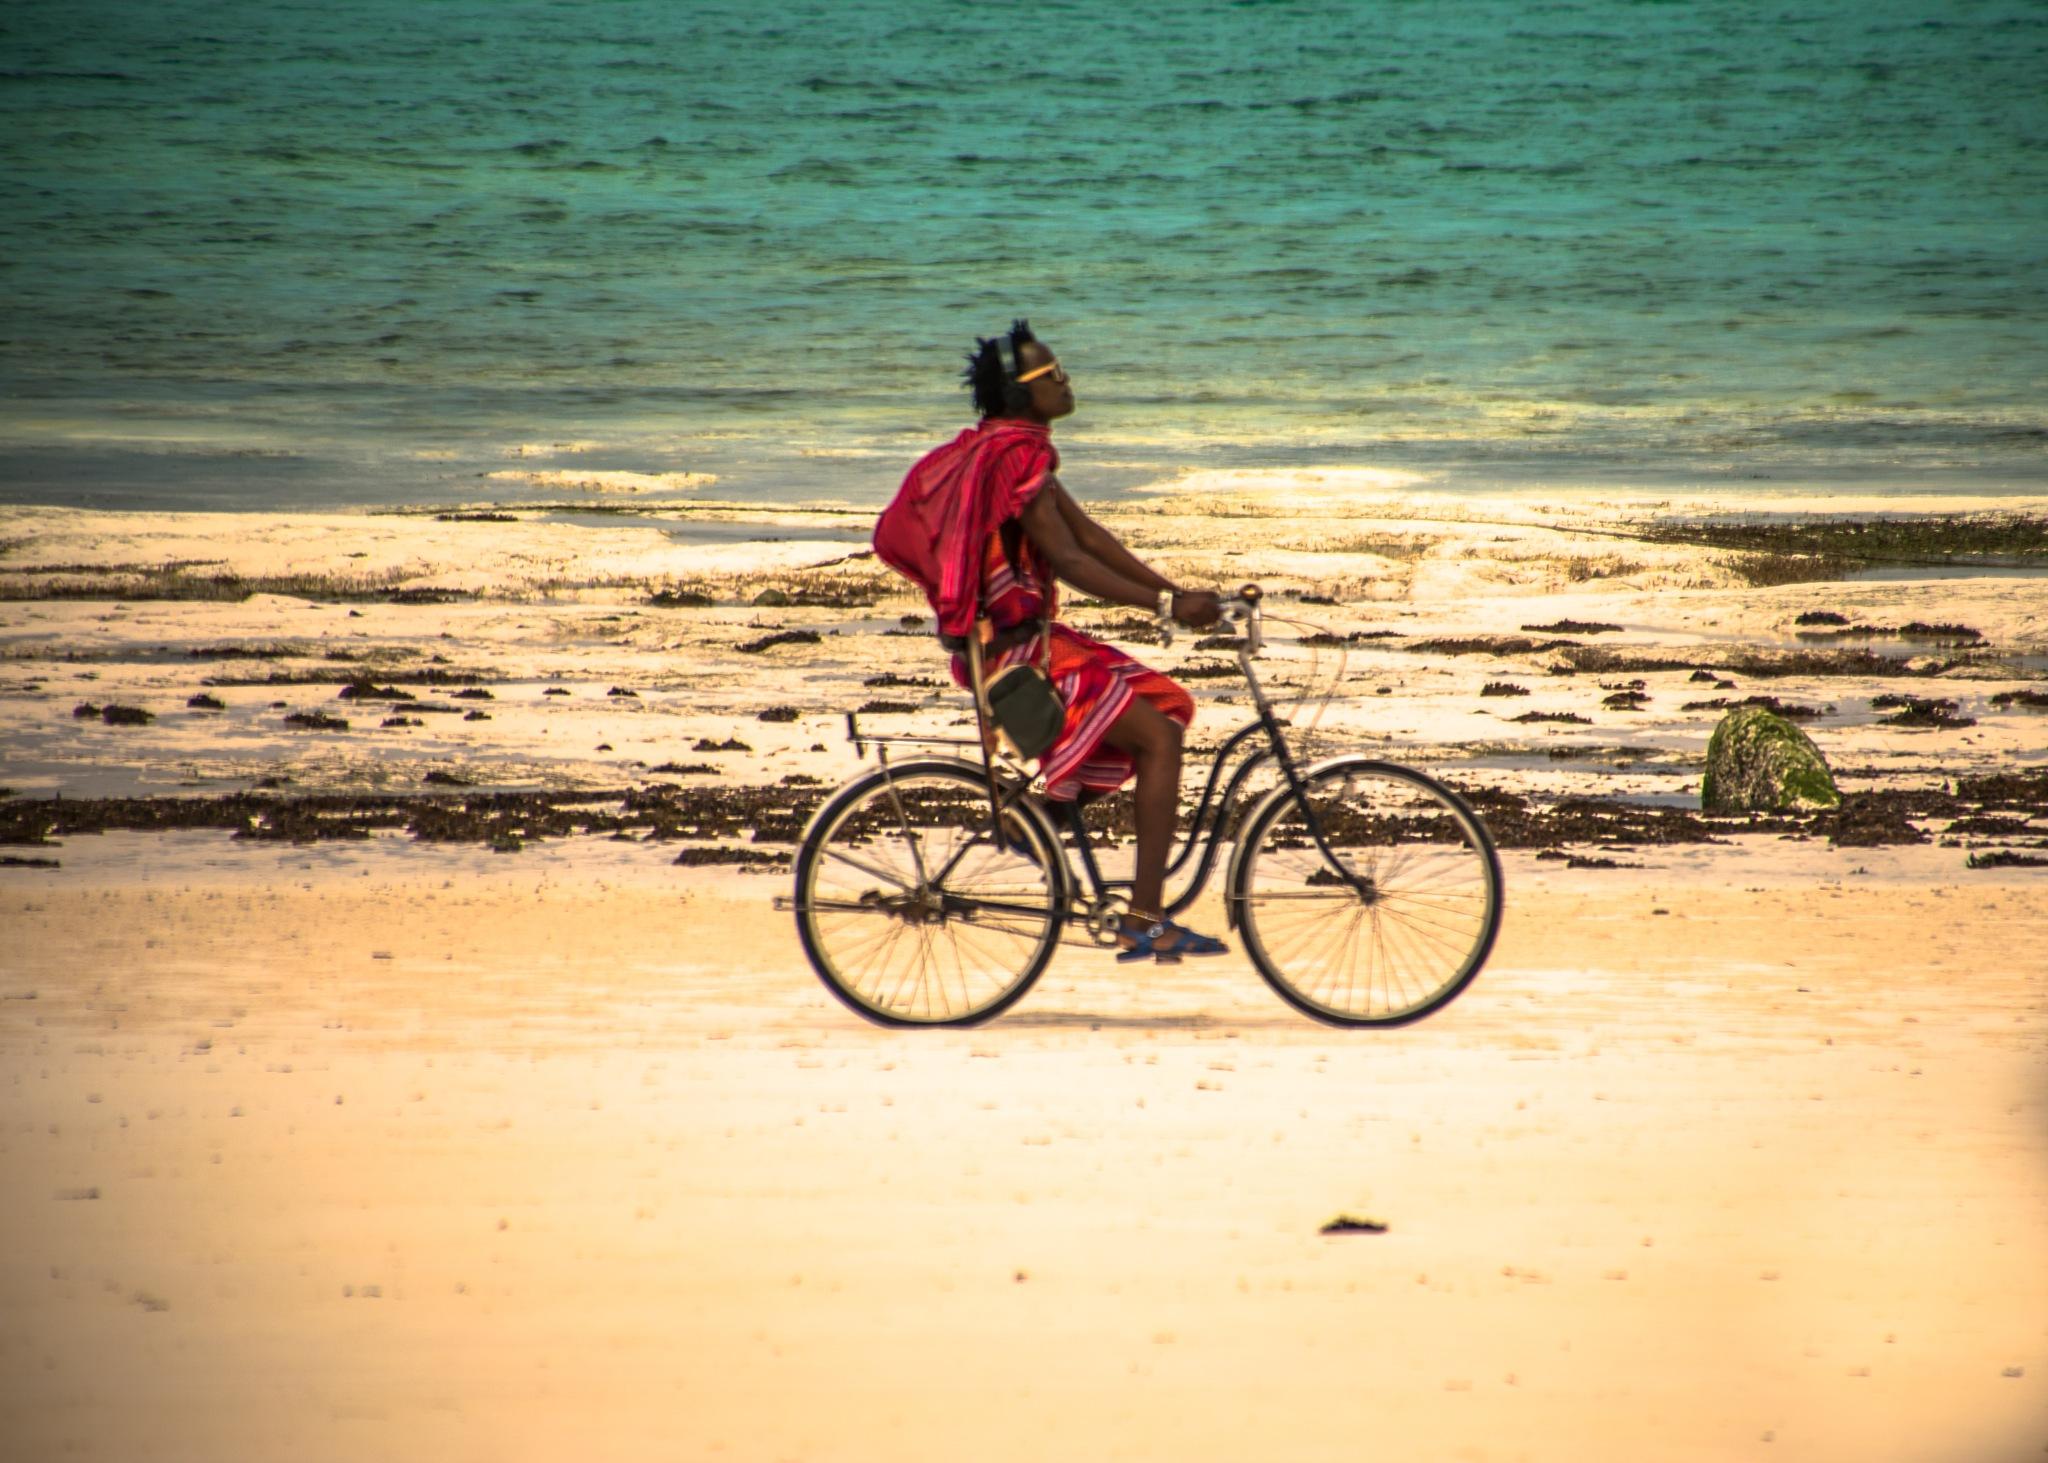 the modern massai goes by bike by Guido Braeuer